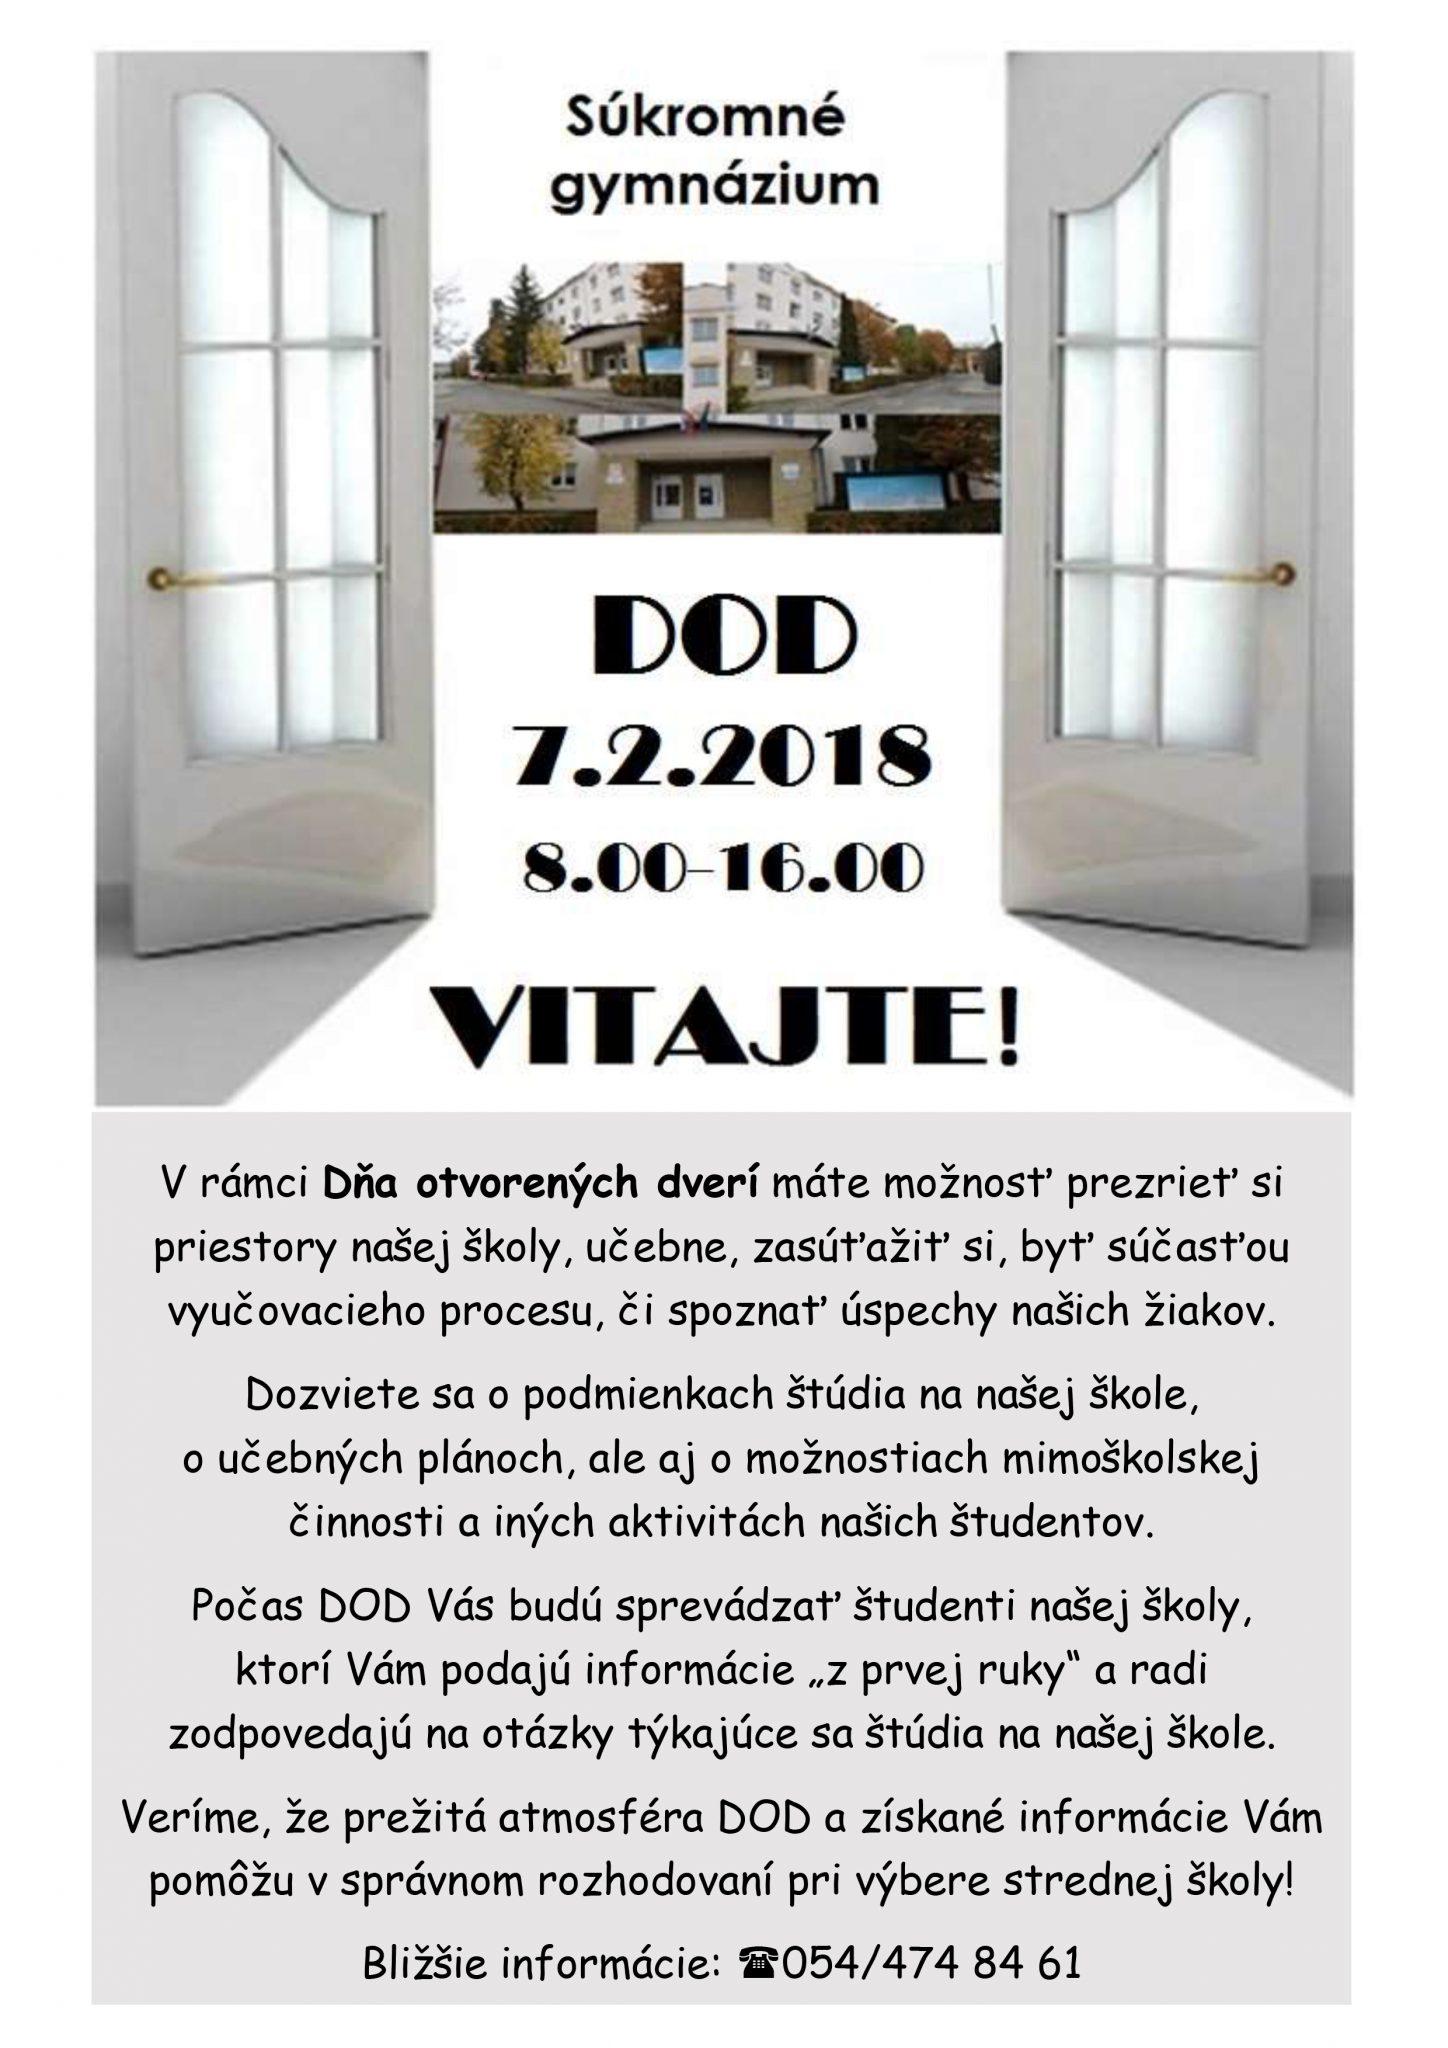 DOD – Súkromné gymnázium